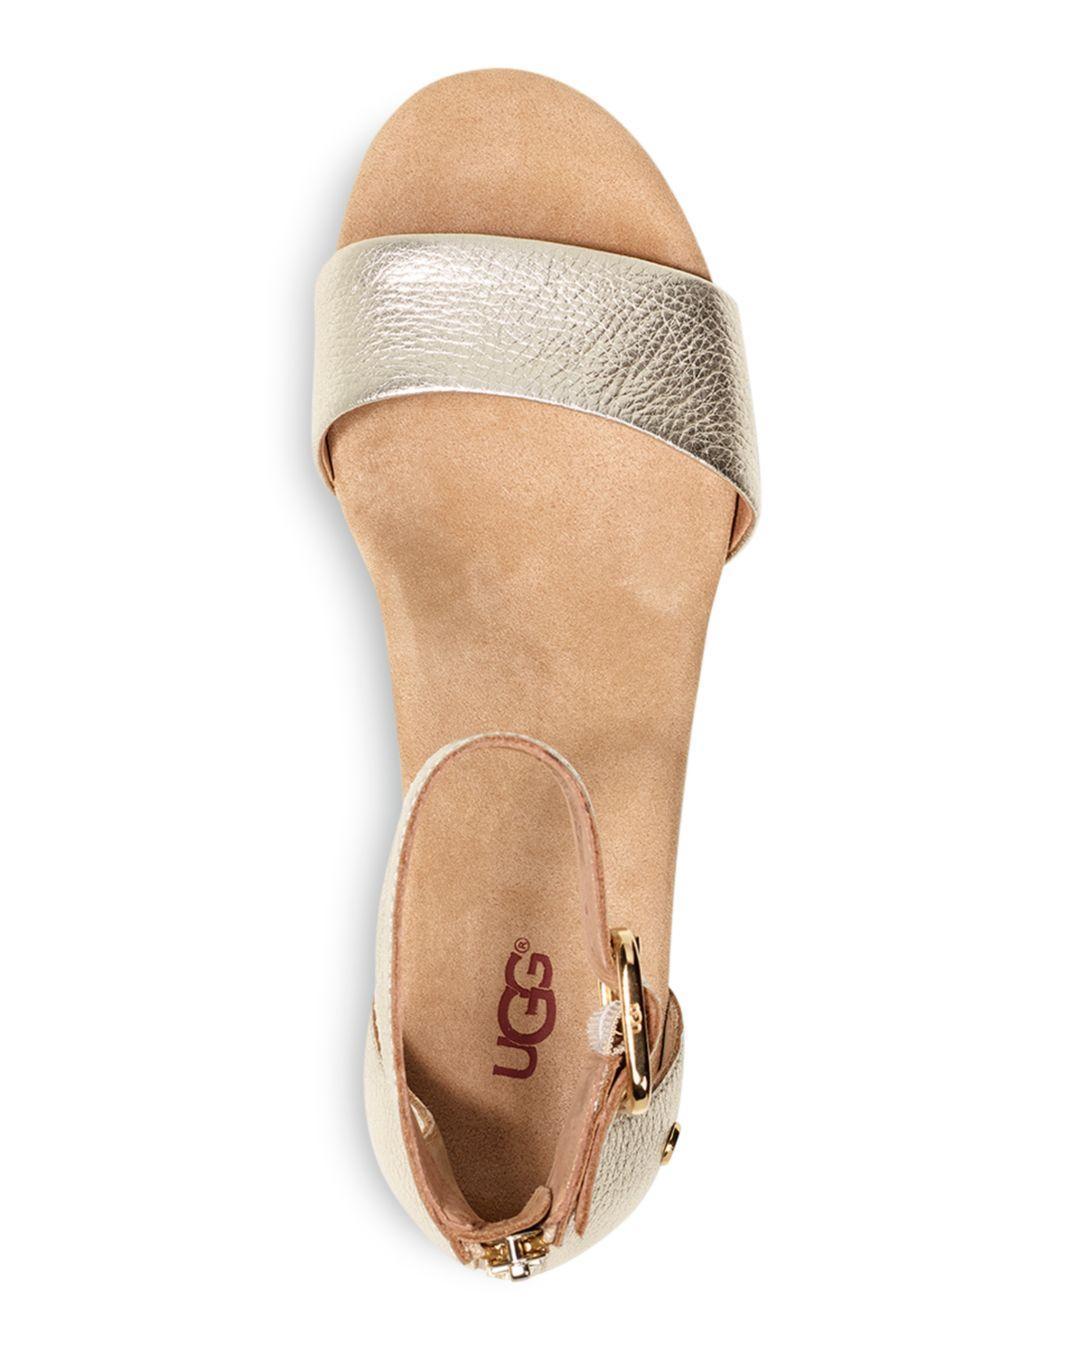 8c6d11d003 Ugg - Women s Zoe Ii Metallic Leather Cork Wedge Ankle Strap Sandals -  Lyst. View fullscreen